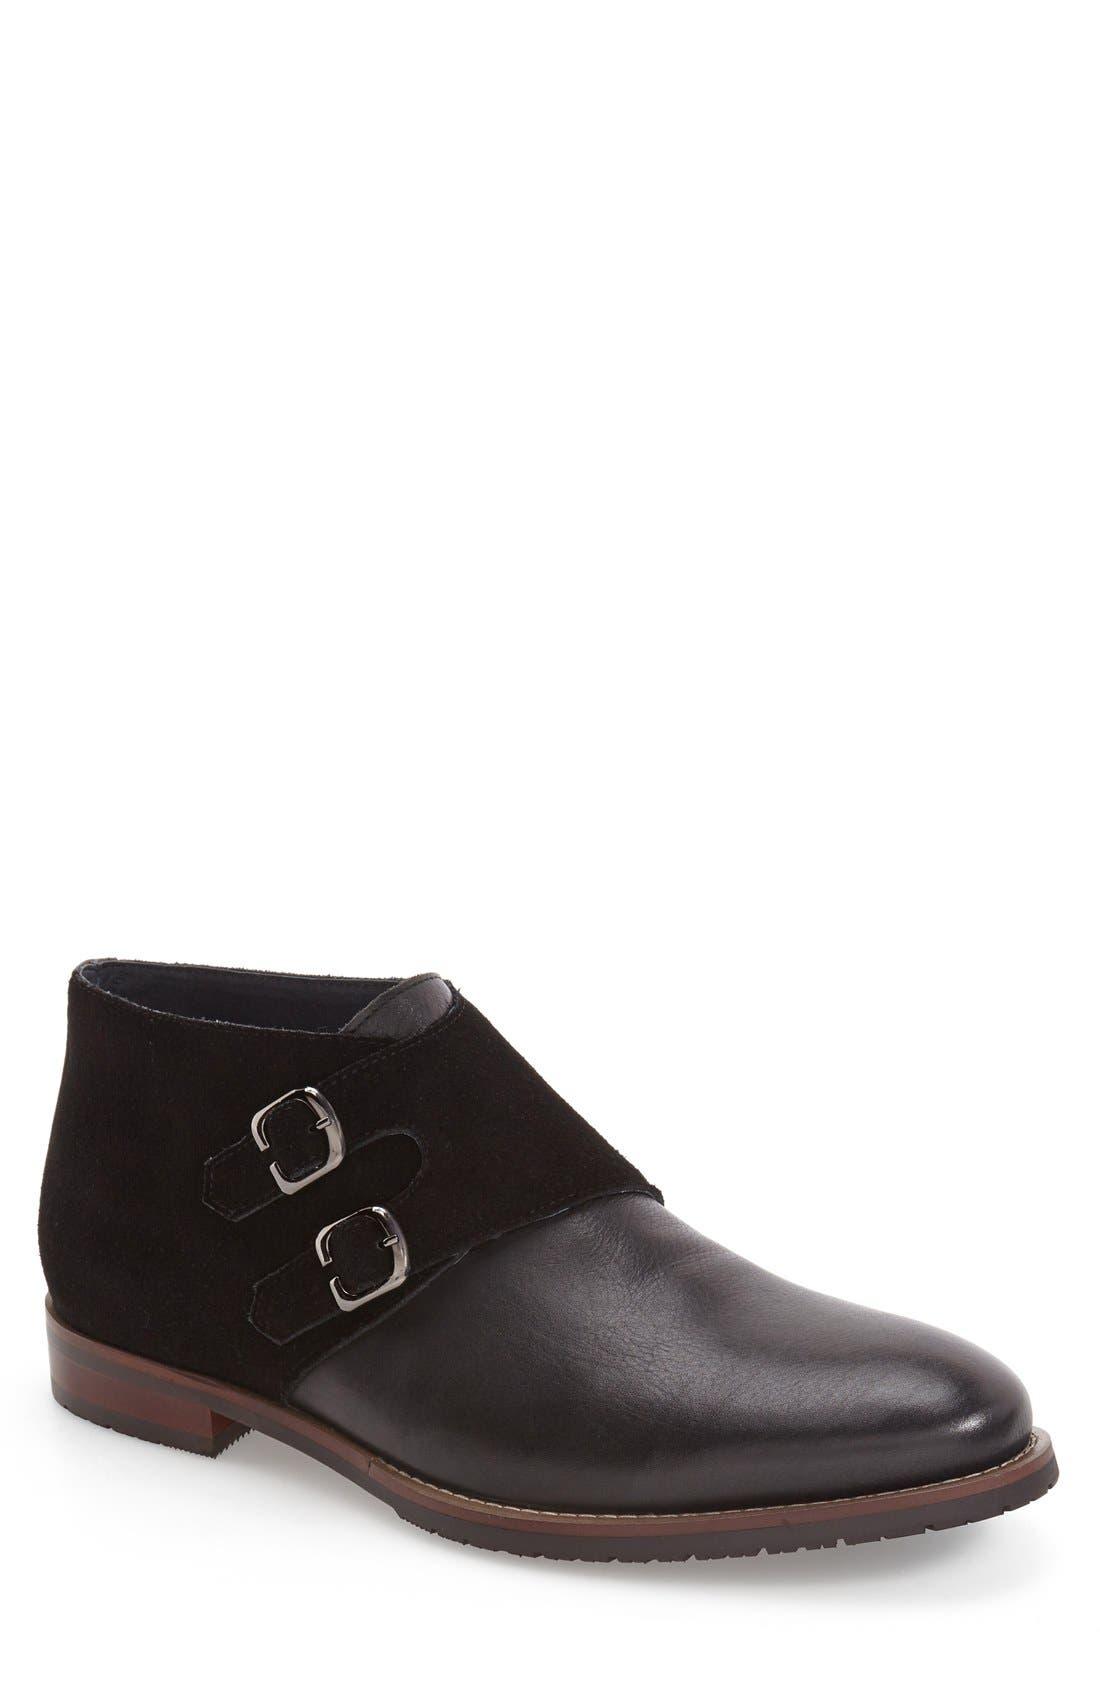 'Napoli' Double Monk Strap Shoe,                             Main thumbnail 1, color,                             001